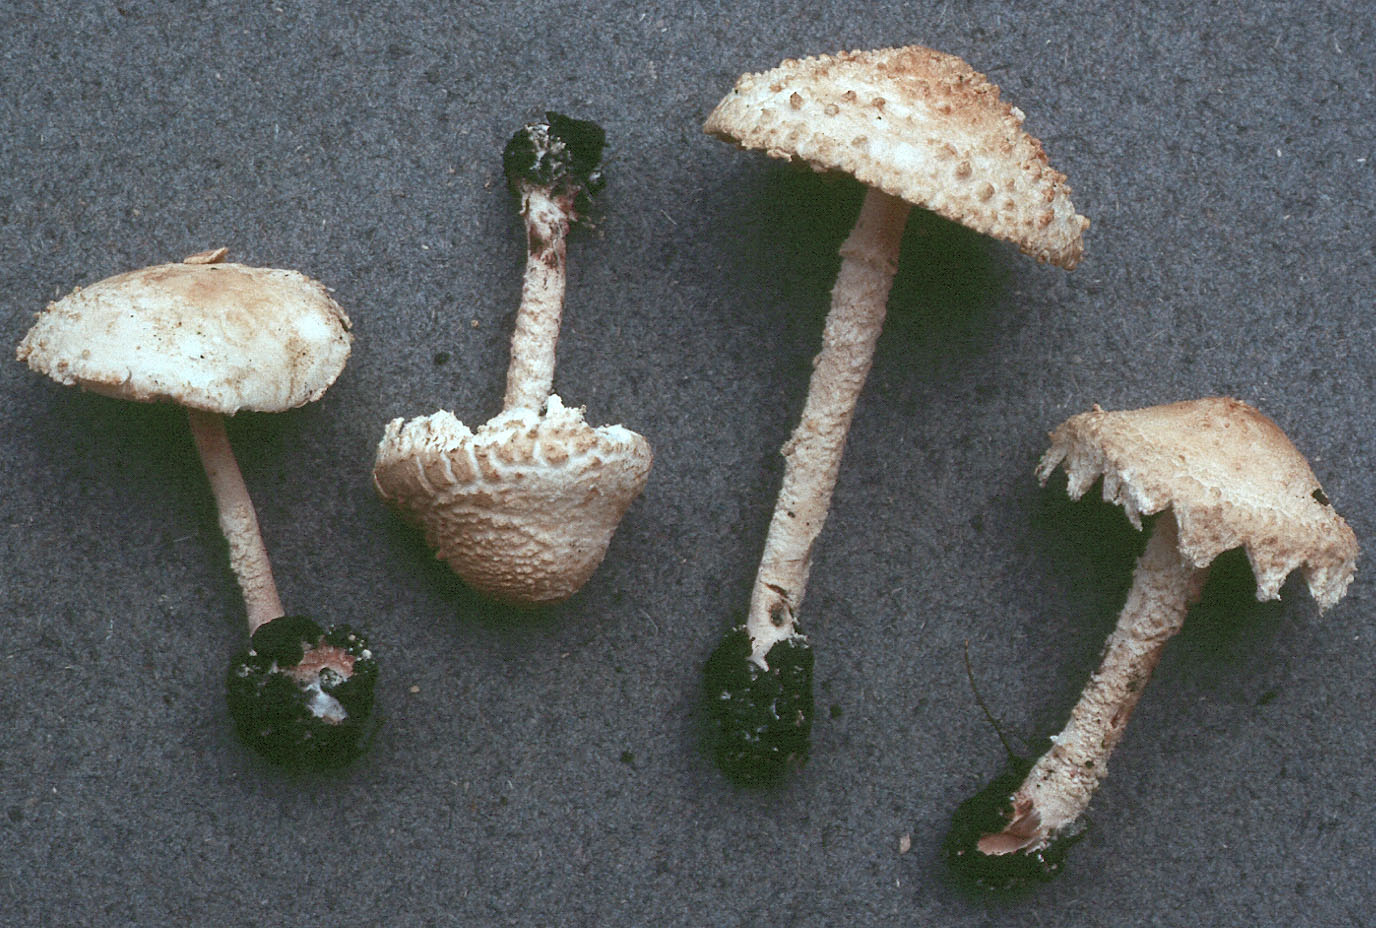 Cystolepiota adulterina